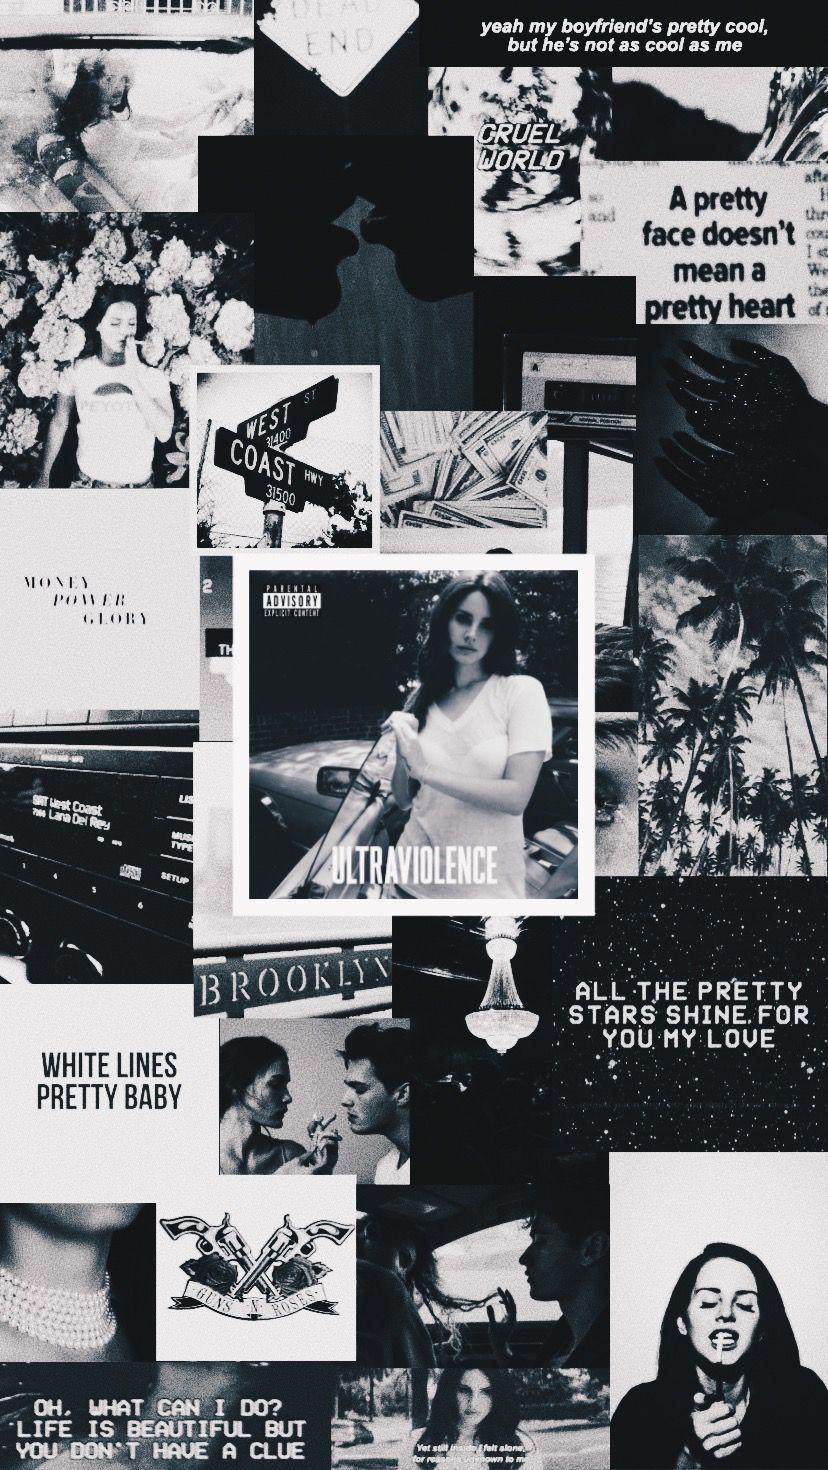 Ultraviolence Lana Del Rey In 2020 Ultraviolence Aesthetic Pastel Wallpaper Aesthetic Iphone Wallpaper